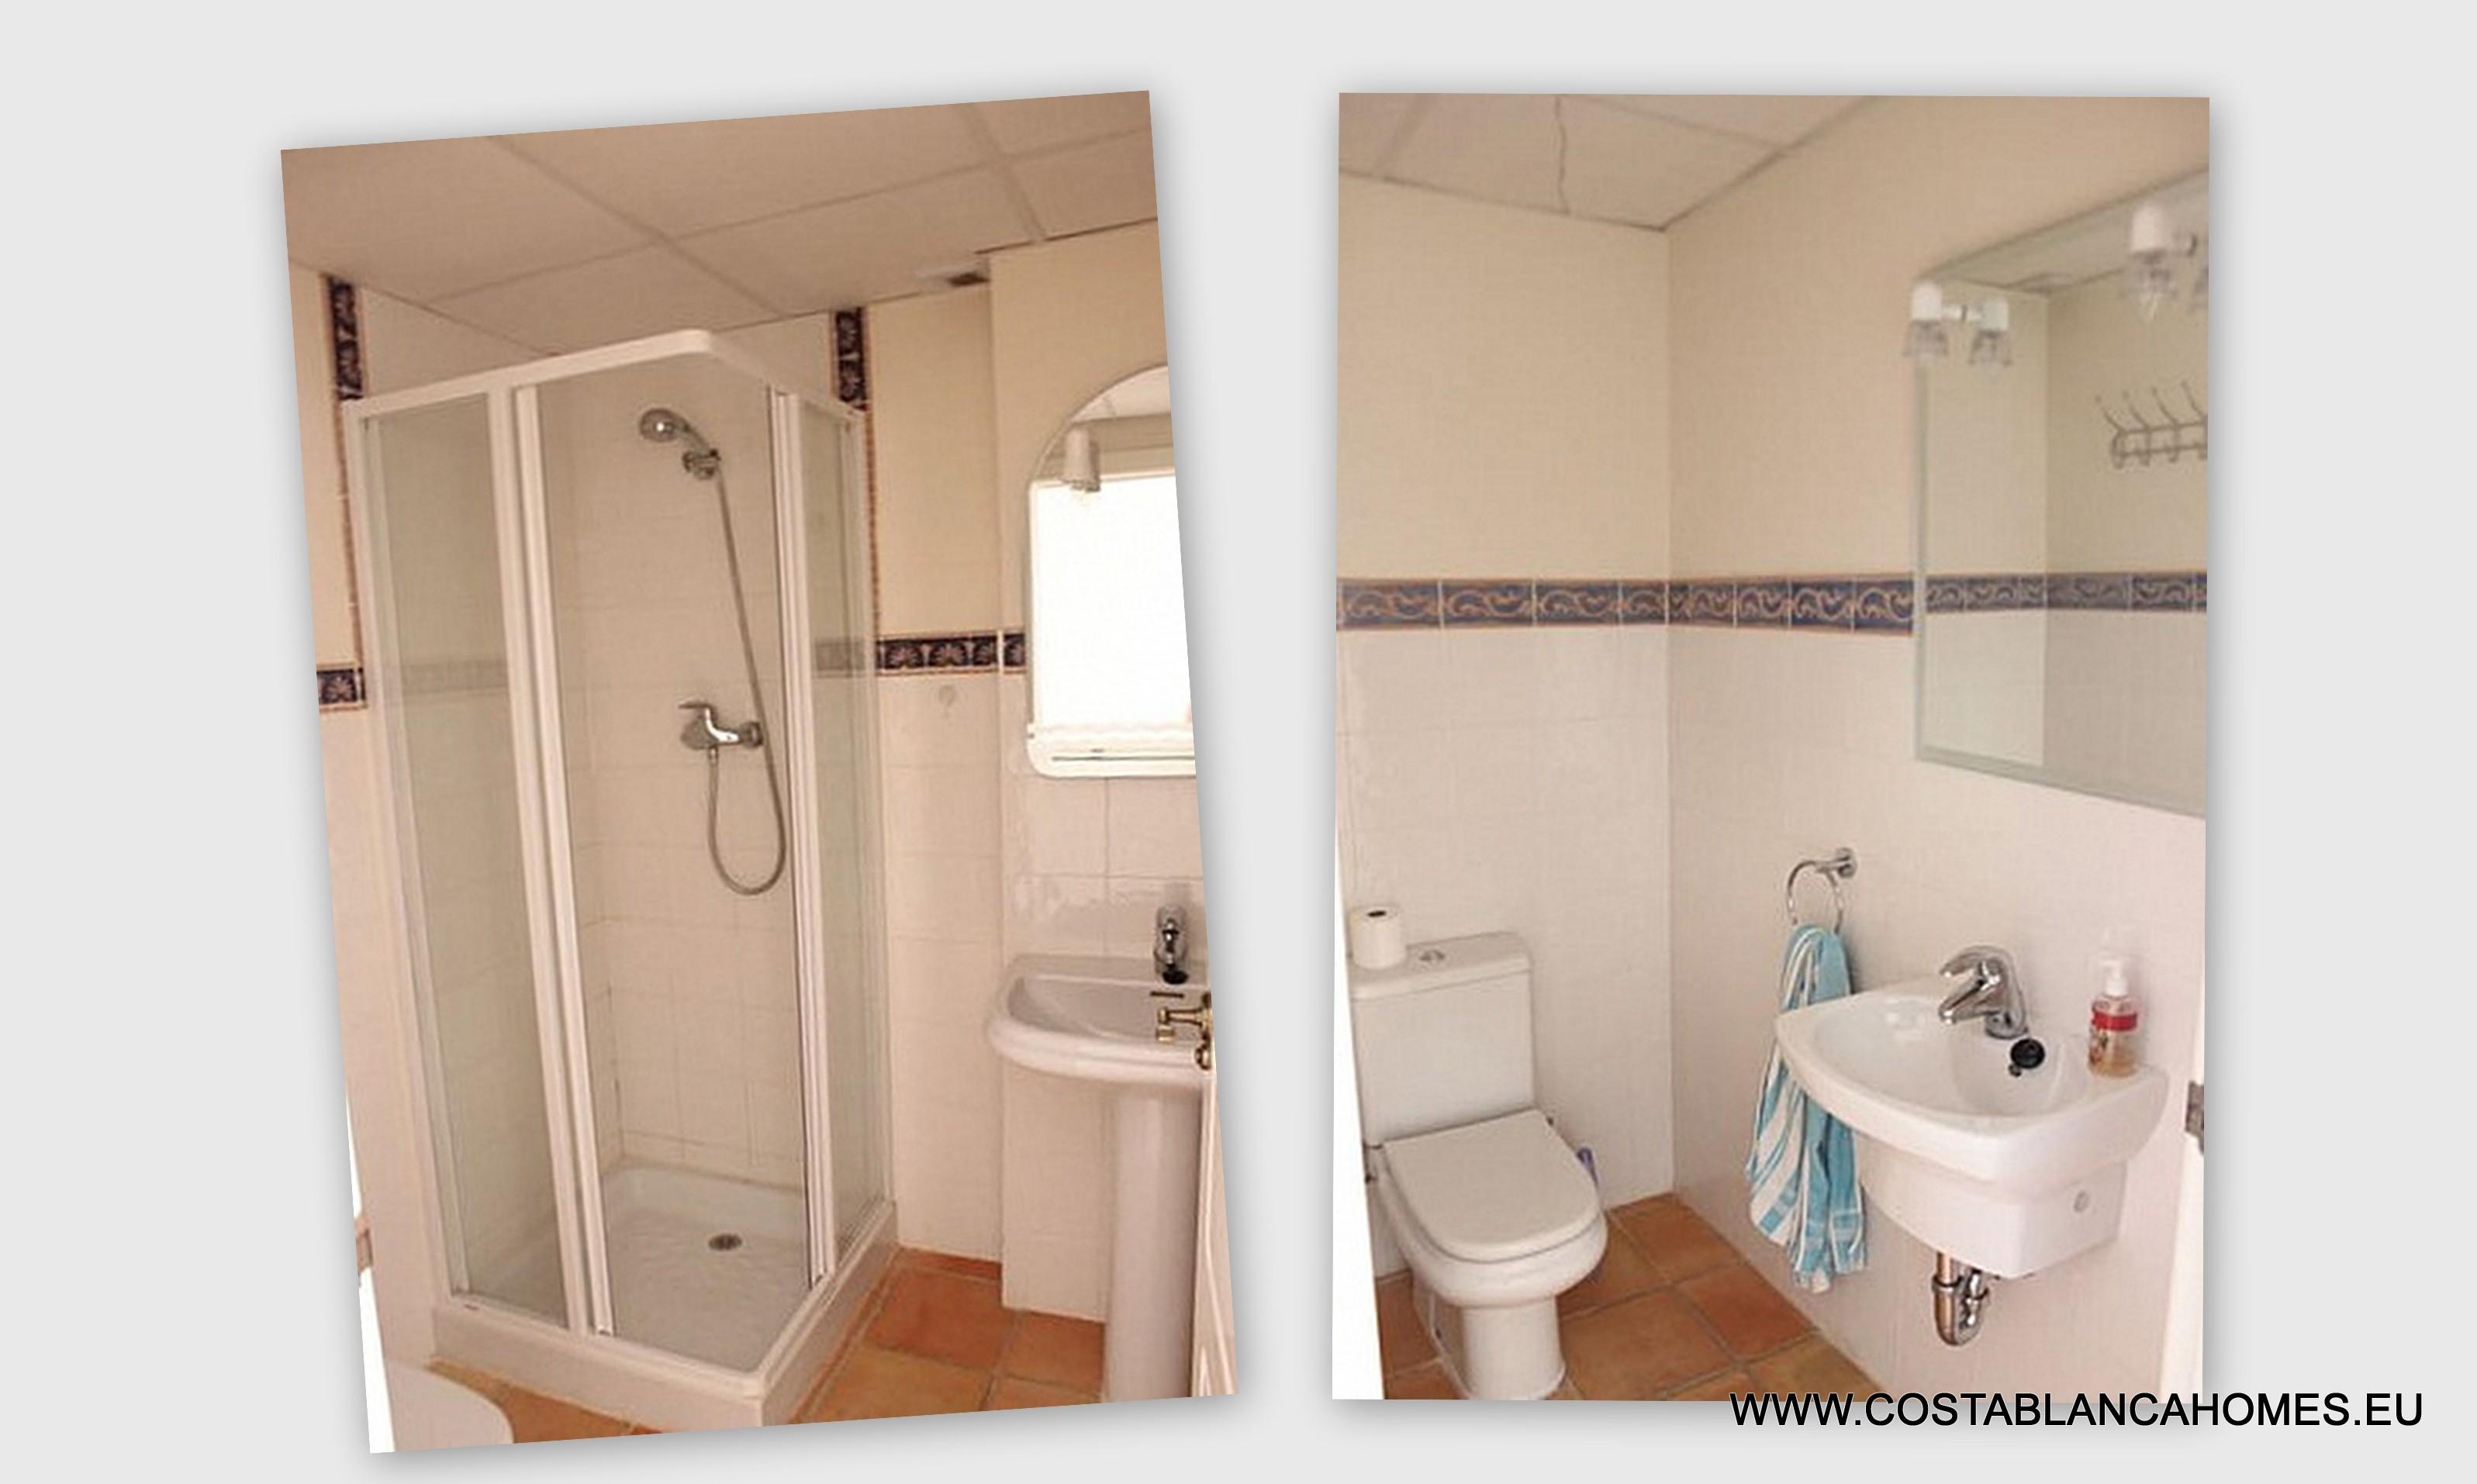 Finestrat townhouse s 131 costa blanca - Vliegtuig badkamer m ...